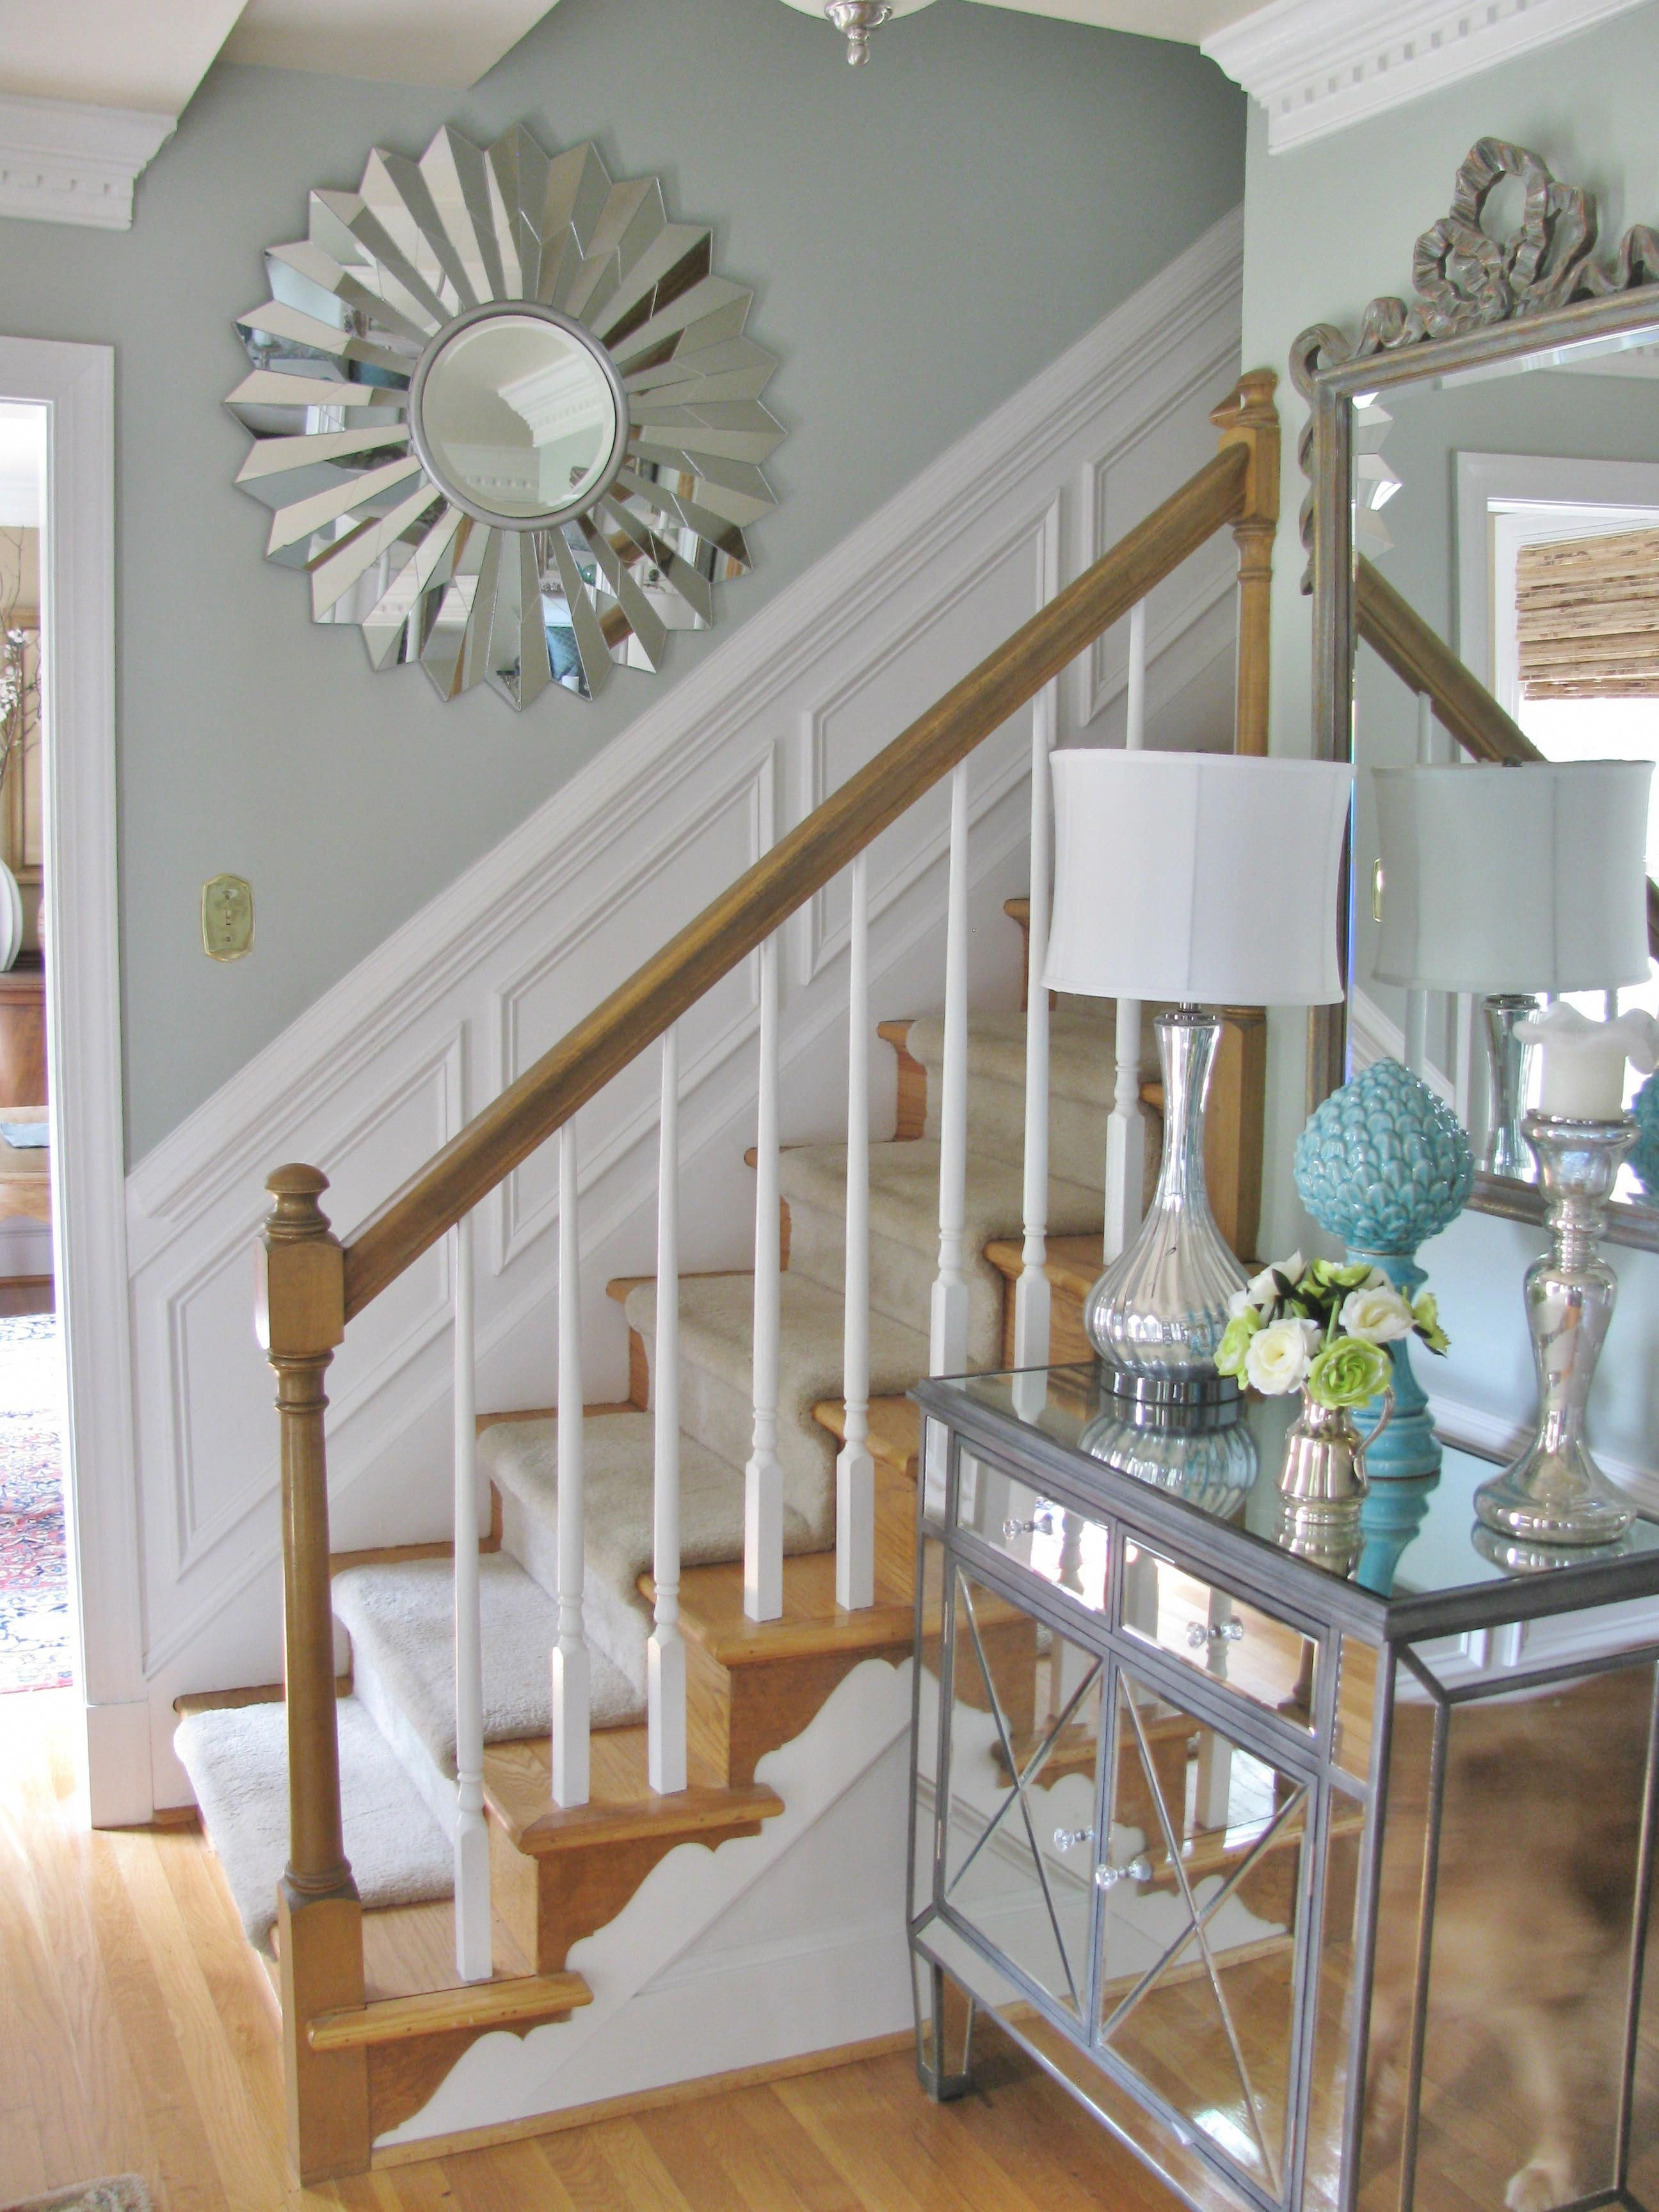 Sherwin Williams Paint Living Room Ideas: Sherwin Williams Comfort Gray- Looks More Like Rain